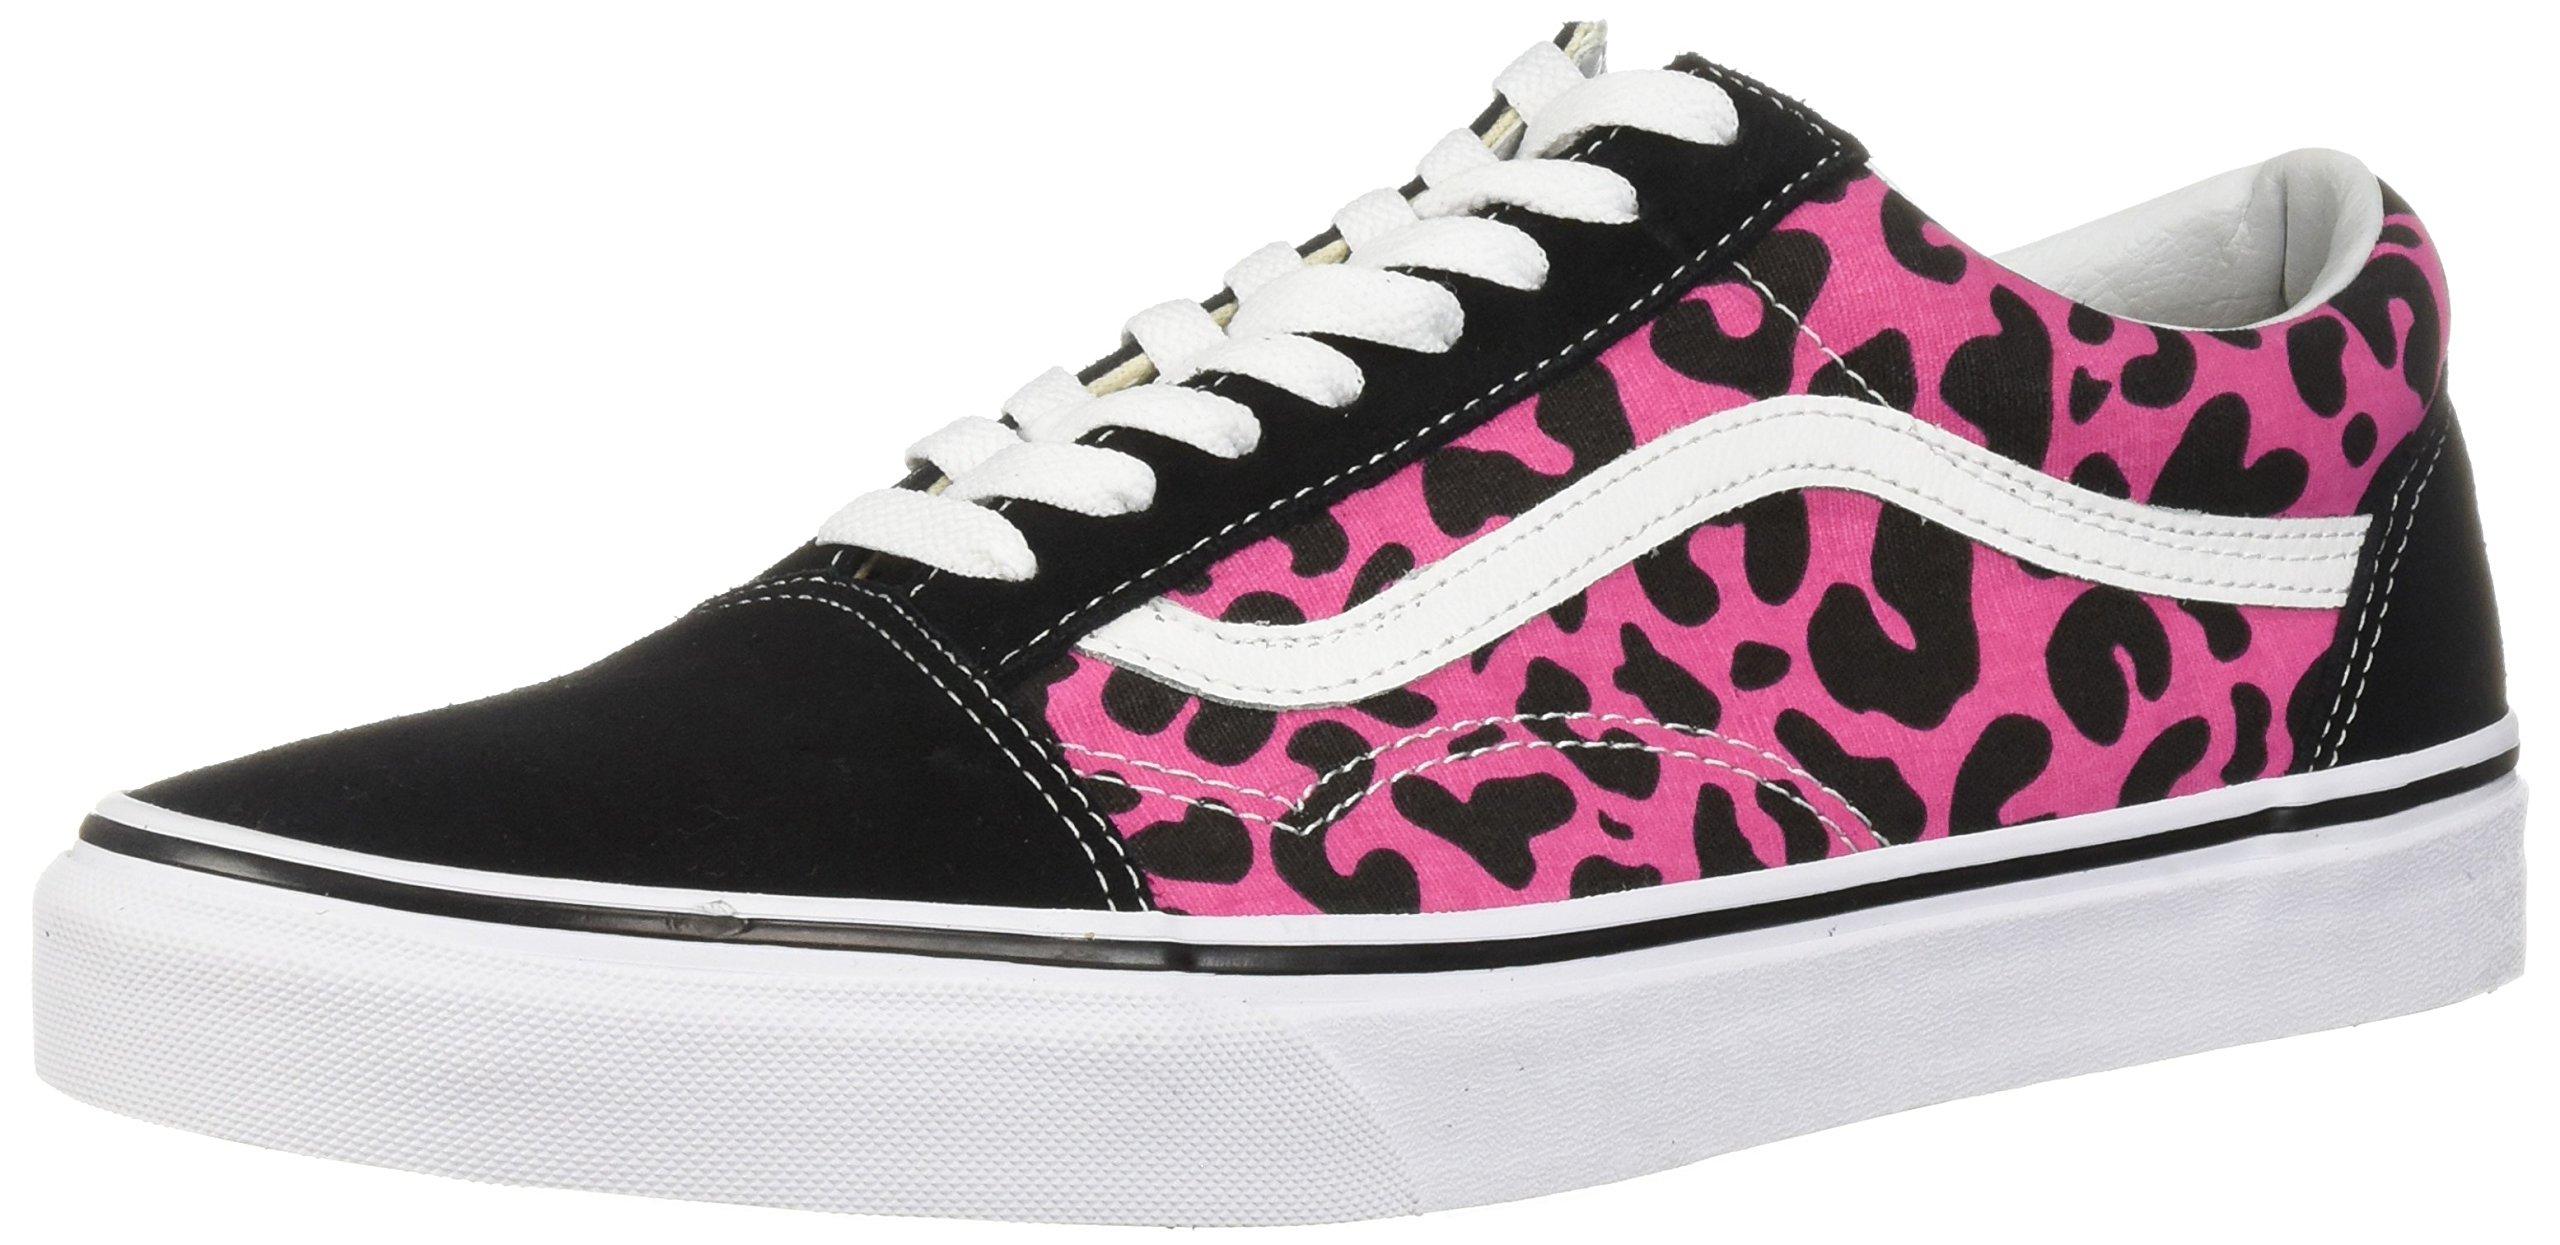 top fashion enjoy big discount detailed look Vans Old Skool Leopard Pink/Black Men's Classic Skate Shoes Size 10.5